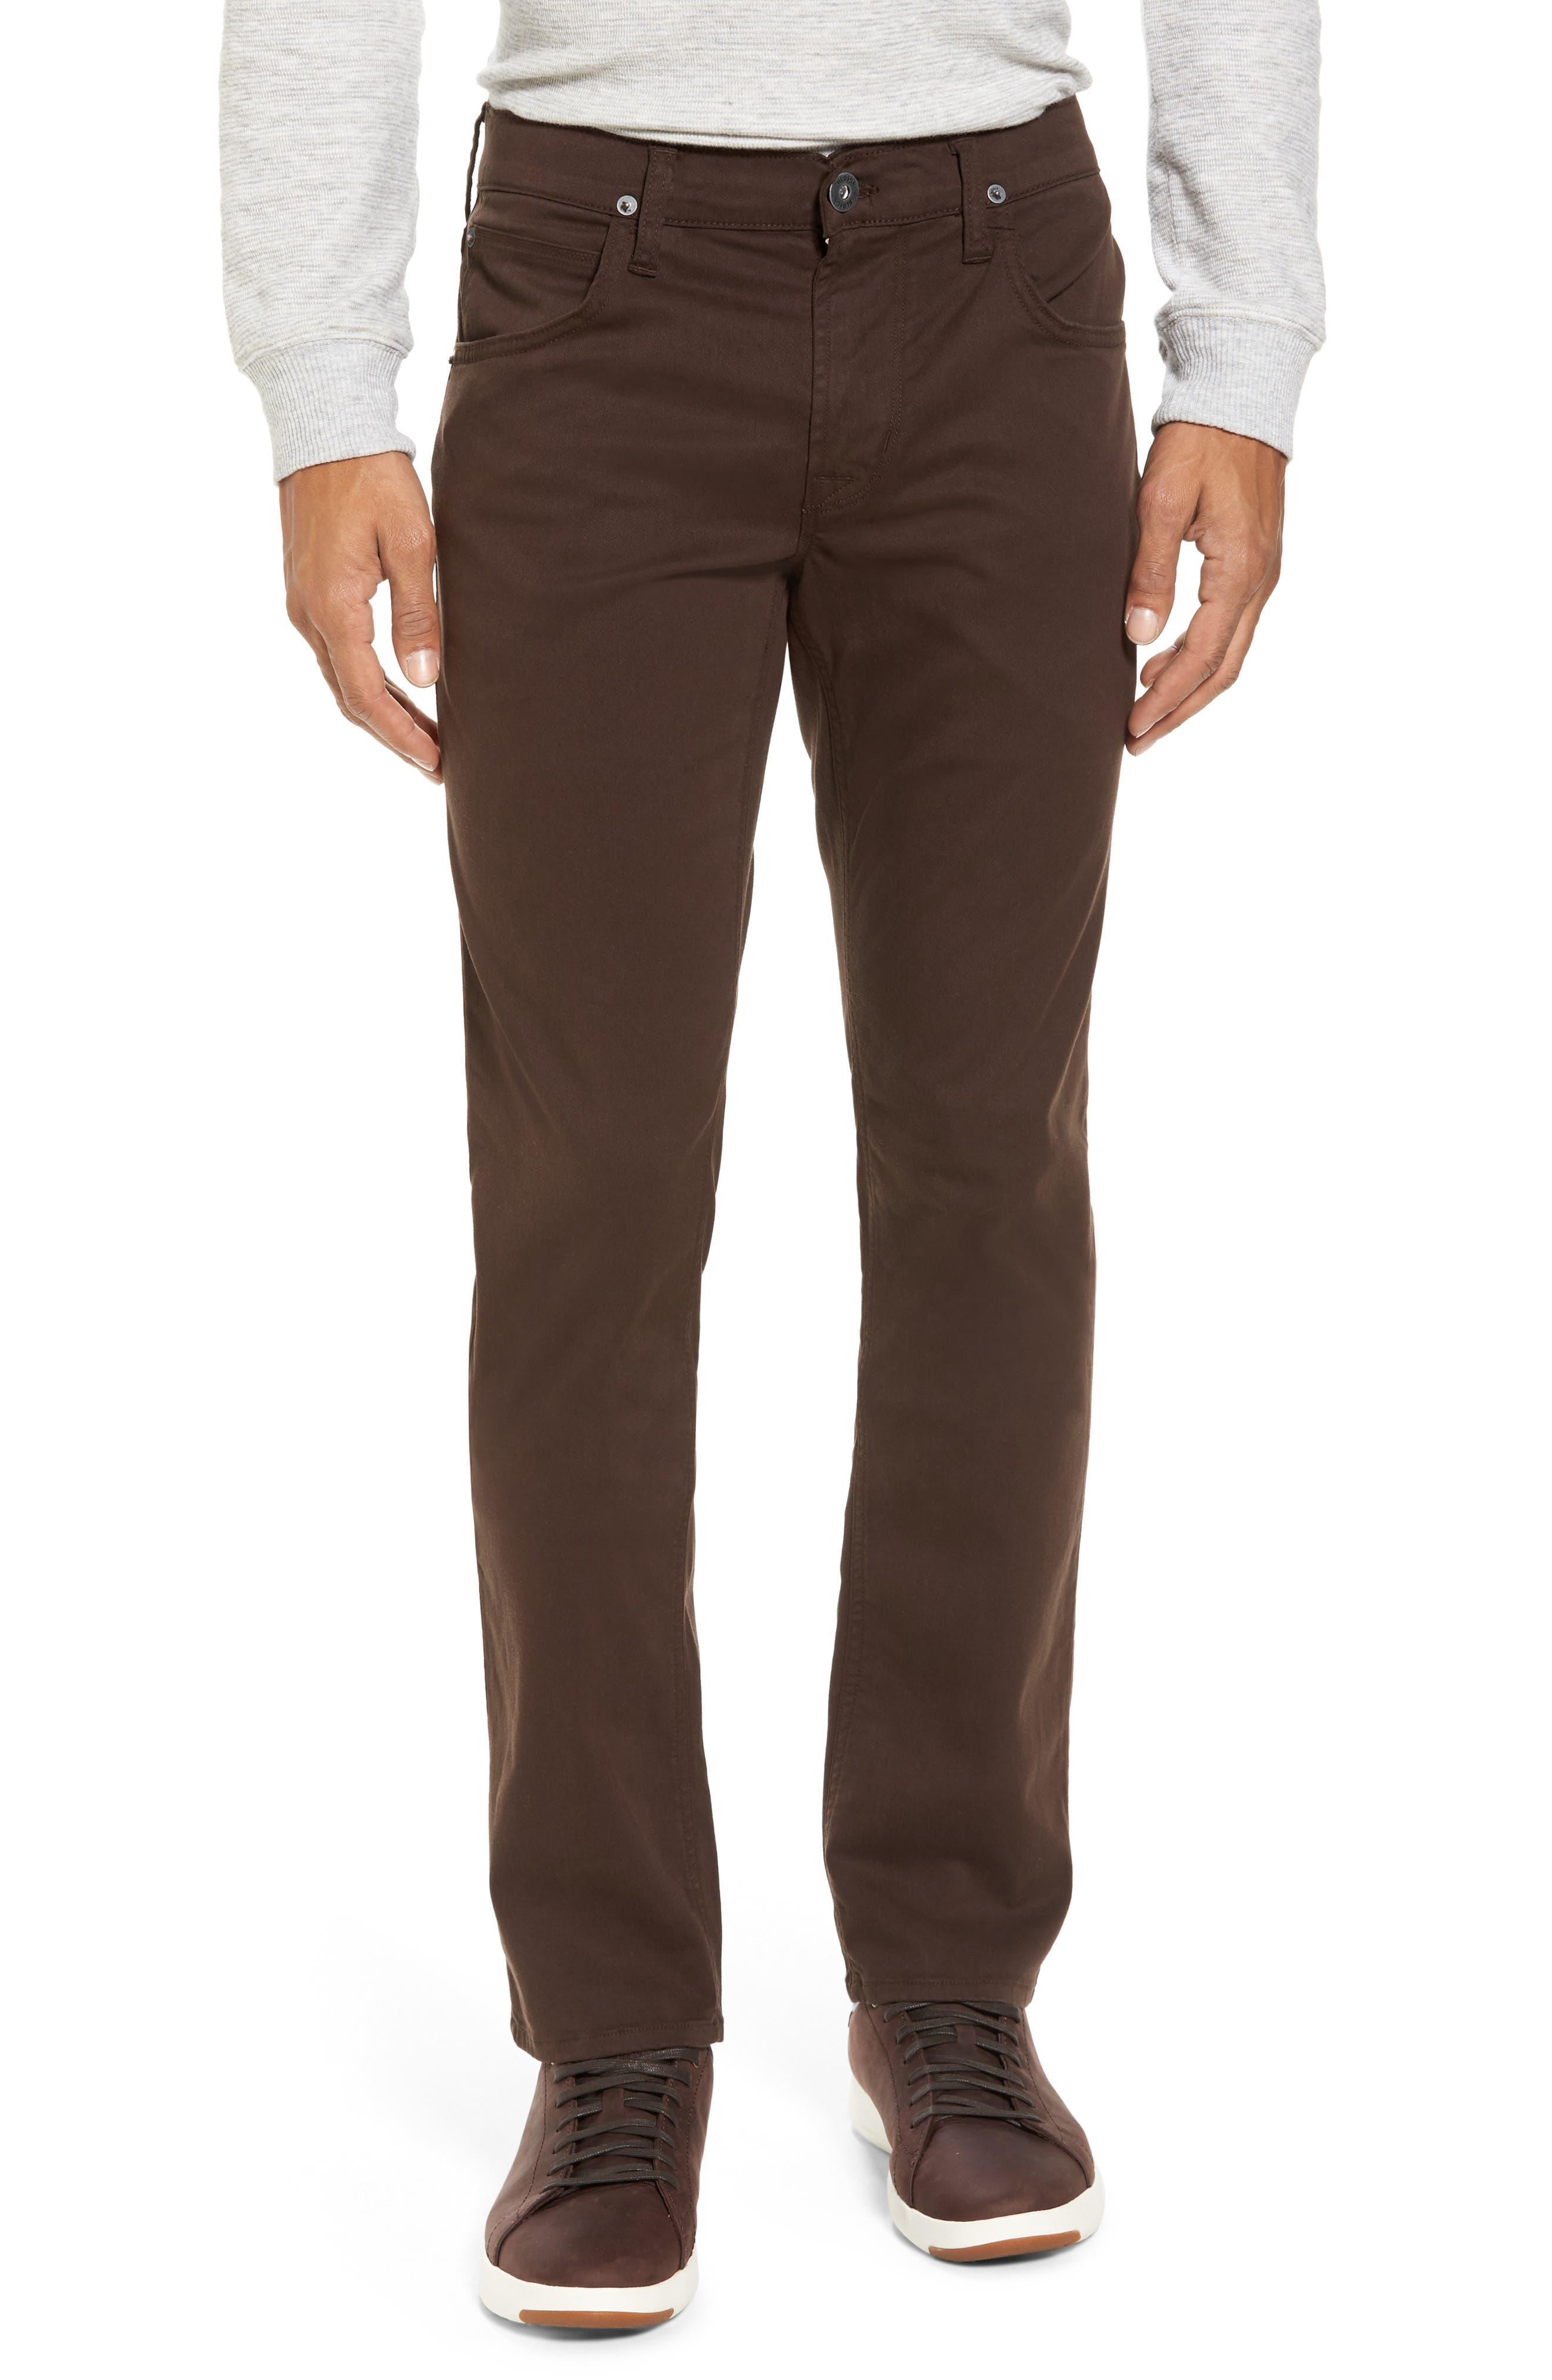 Alternate Image 1 Selected - Hudson Jeans Blake Slim Fit Jeans (Brew)